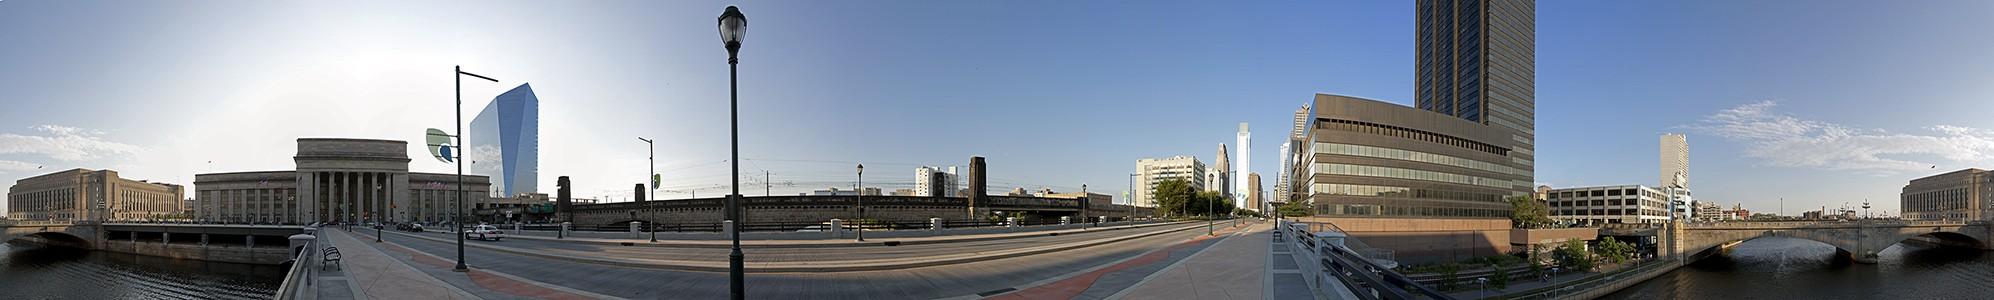 Philadelphia 30th Street Station, Cira Centre, John F. Kennedy Boulevard Bridge, Penn Center, Market Street Bridge